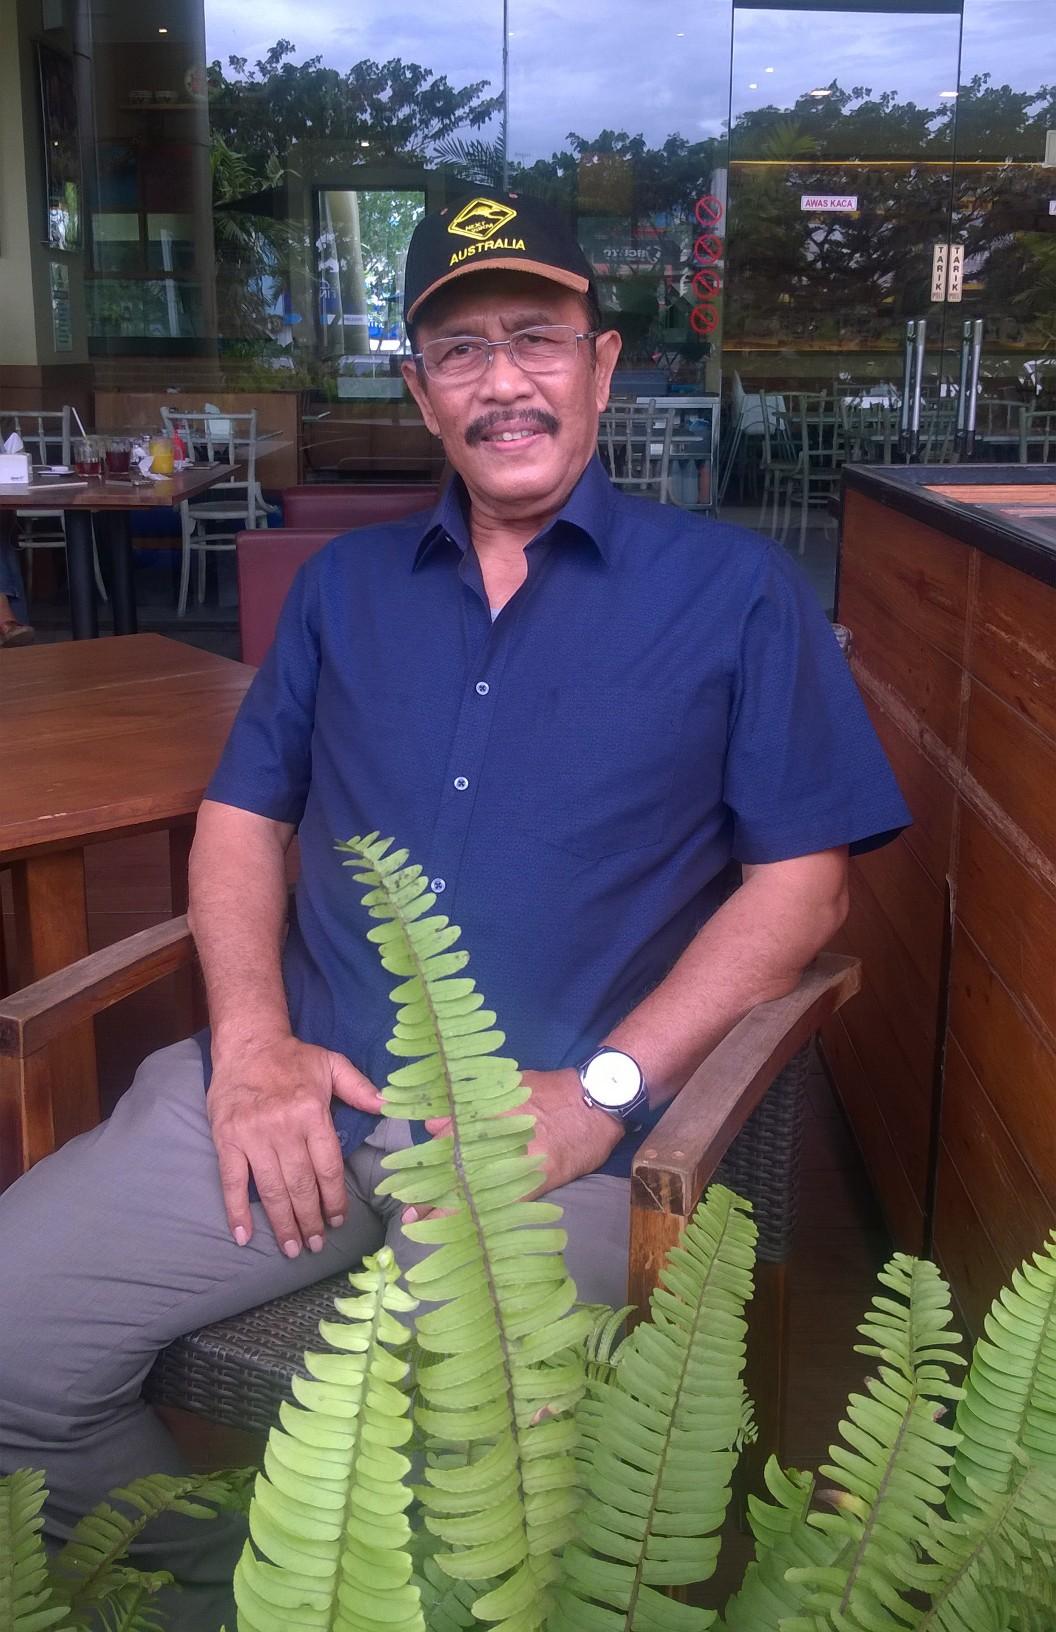 POLITIK TNI ADALAH POLITIK NEGARA YANG BERDIRI DIATAS SEMUA GOLONGAN